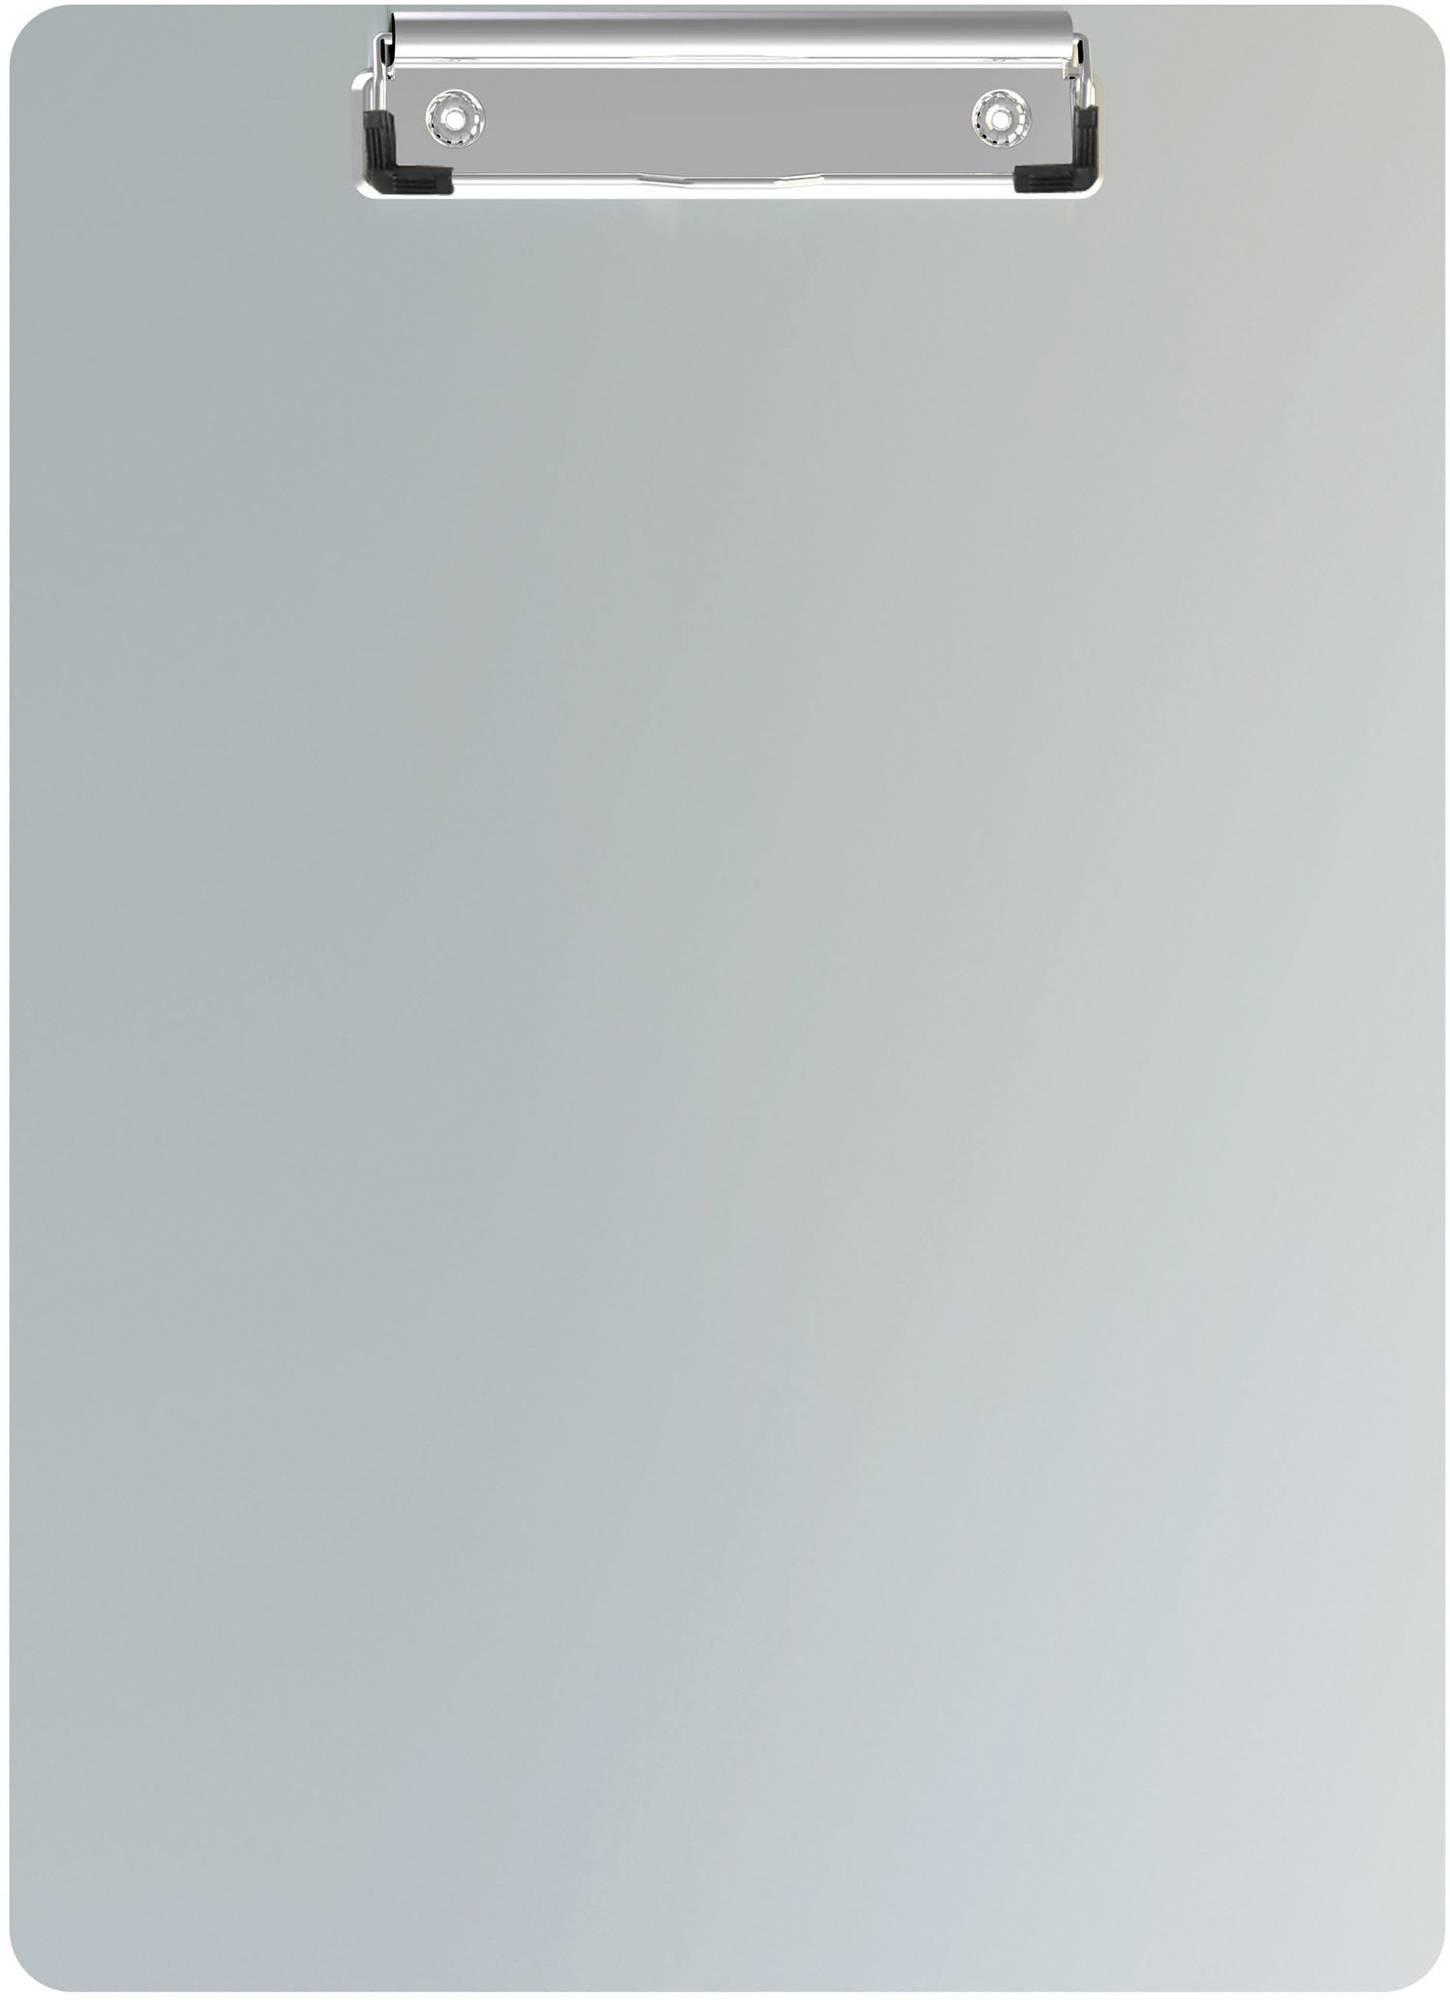 Aluminium-Klemmbrett A4 aus Aluminium mit Bügelklemme, Aufhängeöse und Magnet